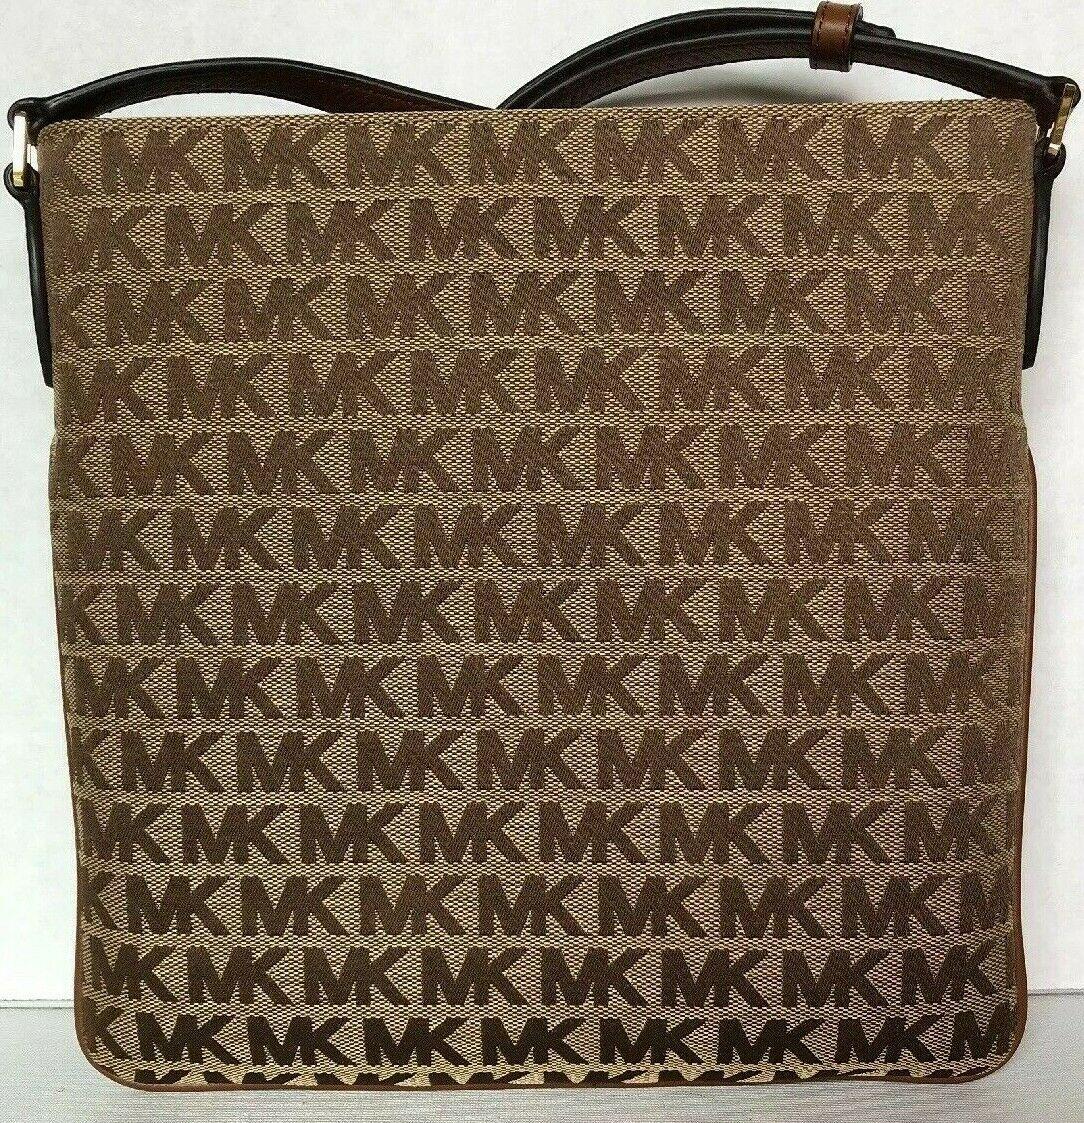 New Michael Kors Connie Large NS Crossbody Bag Jacquard Beige / Ebony